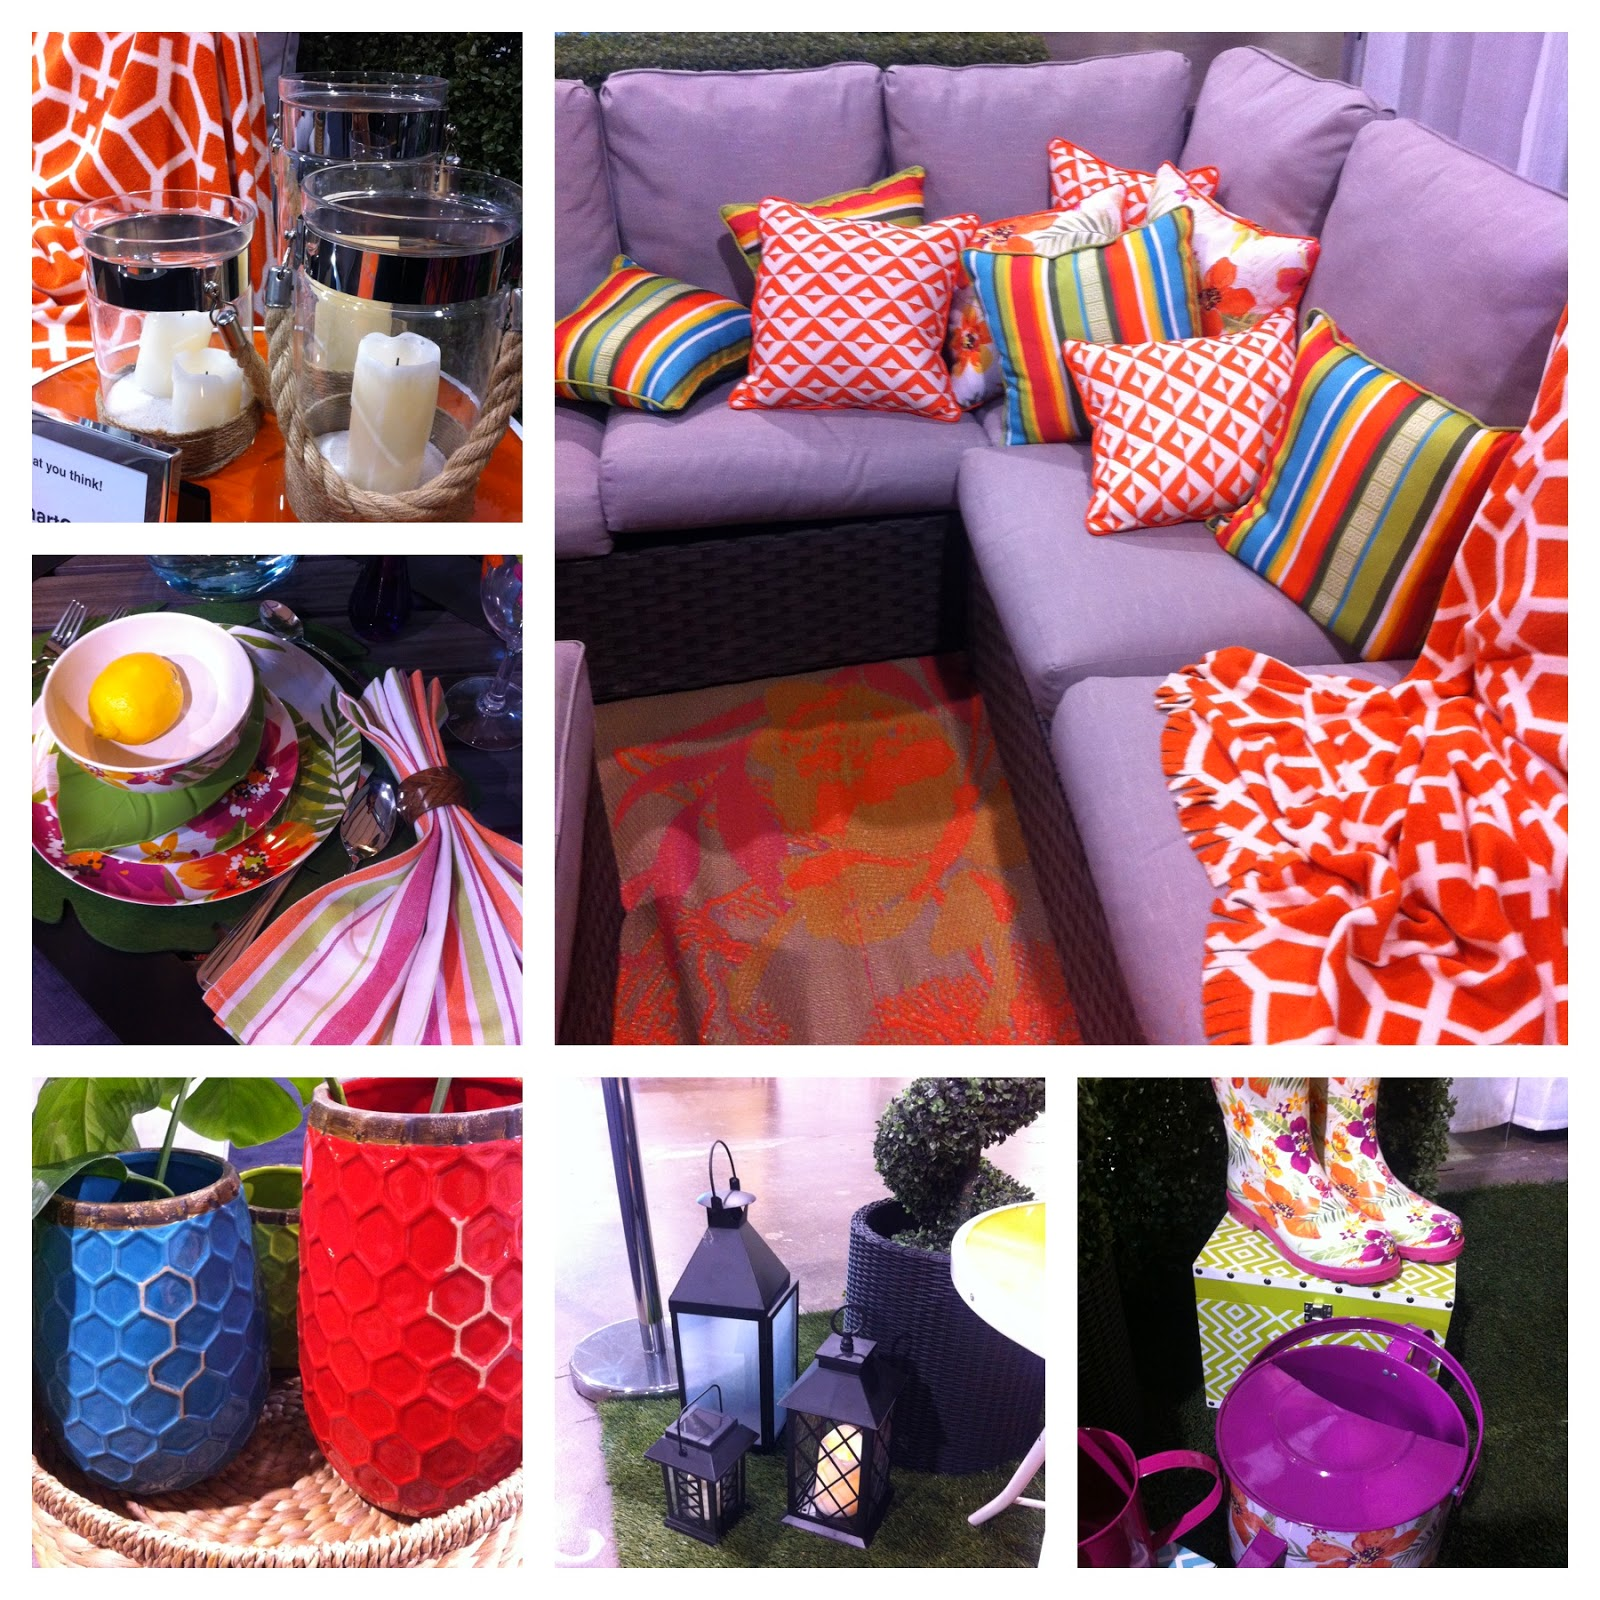 Walmart's Spring/Summer Outdoor Living Collection Shines ... on Walmart Outdoor Living id=46050